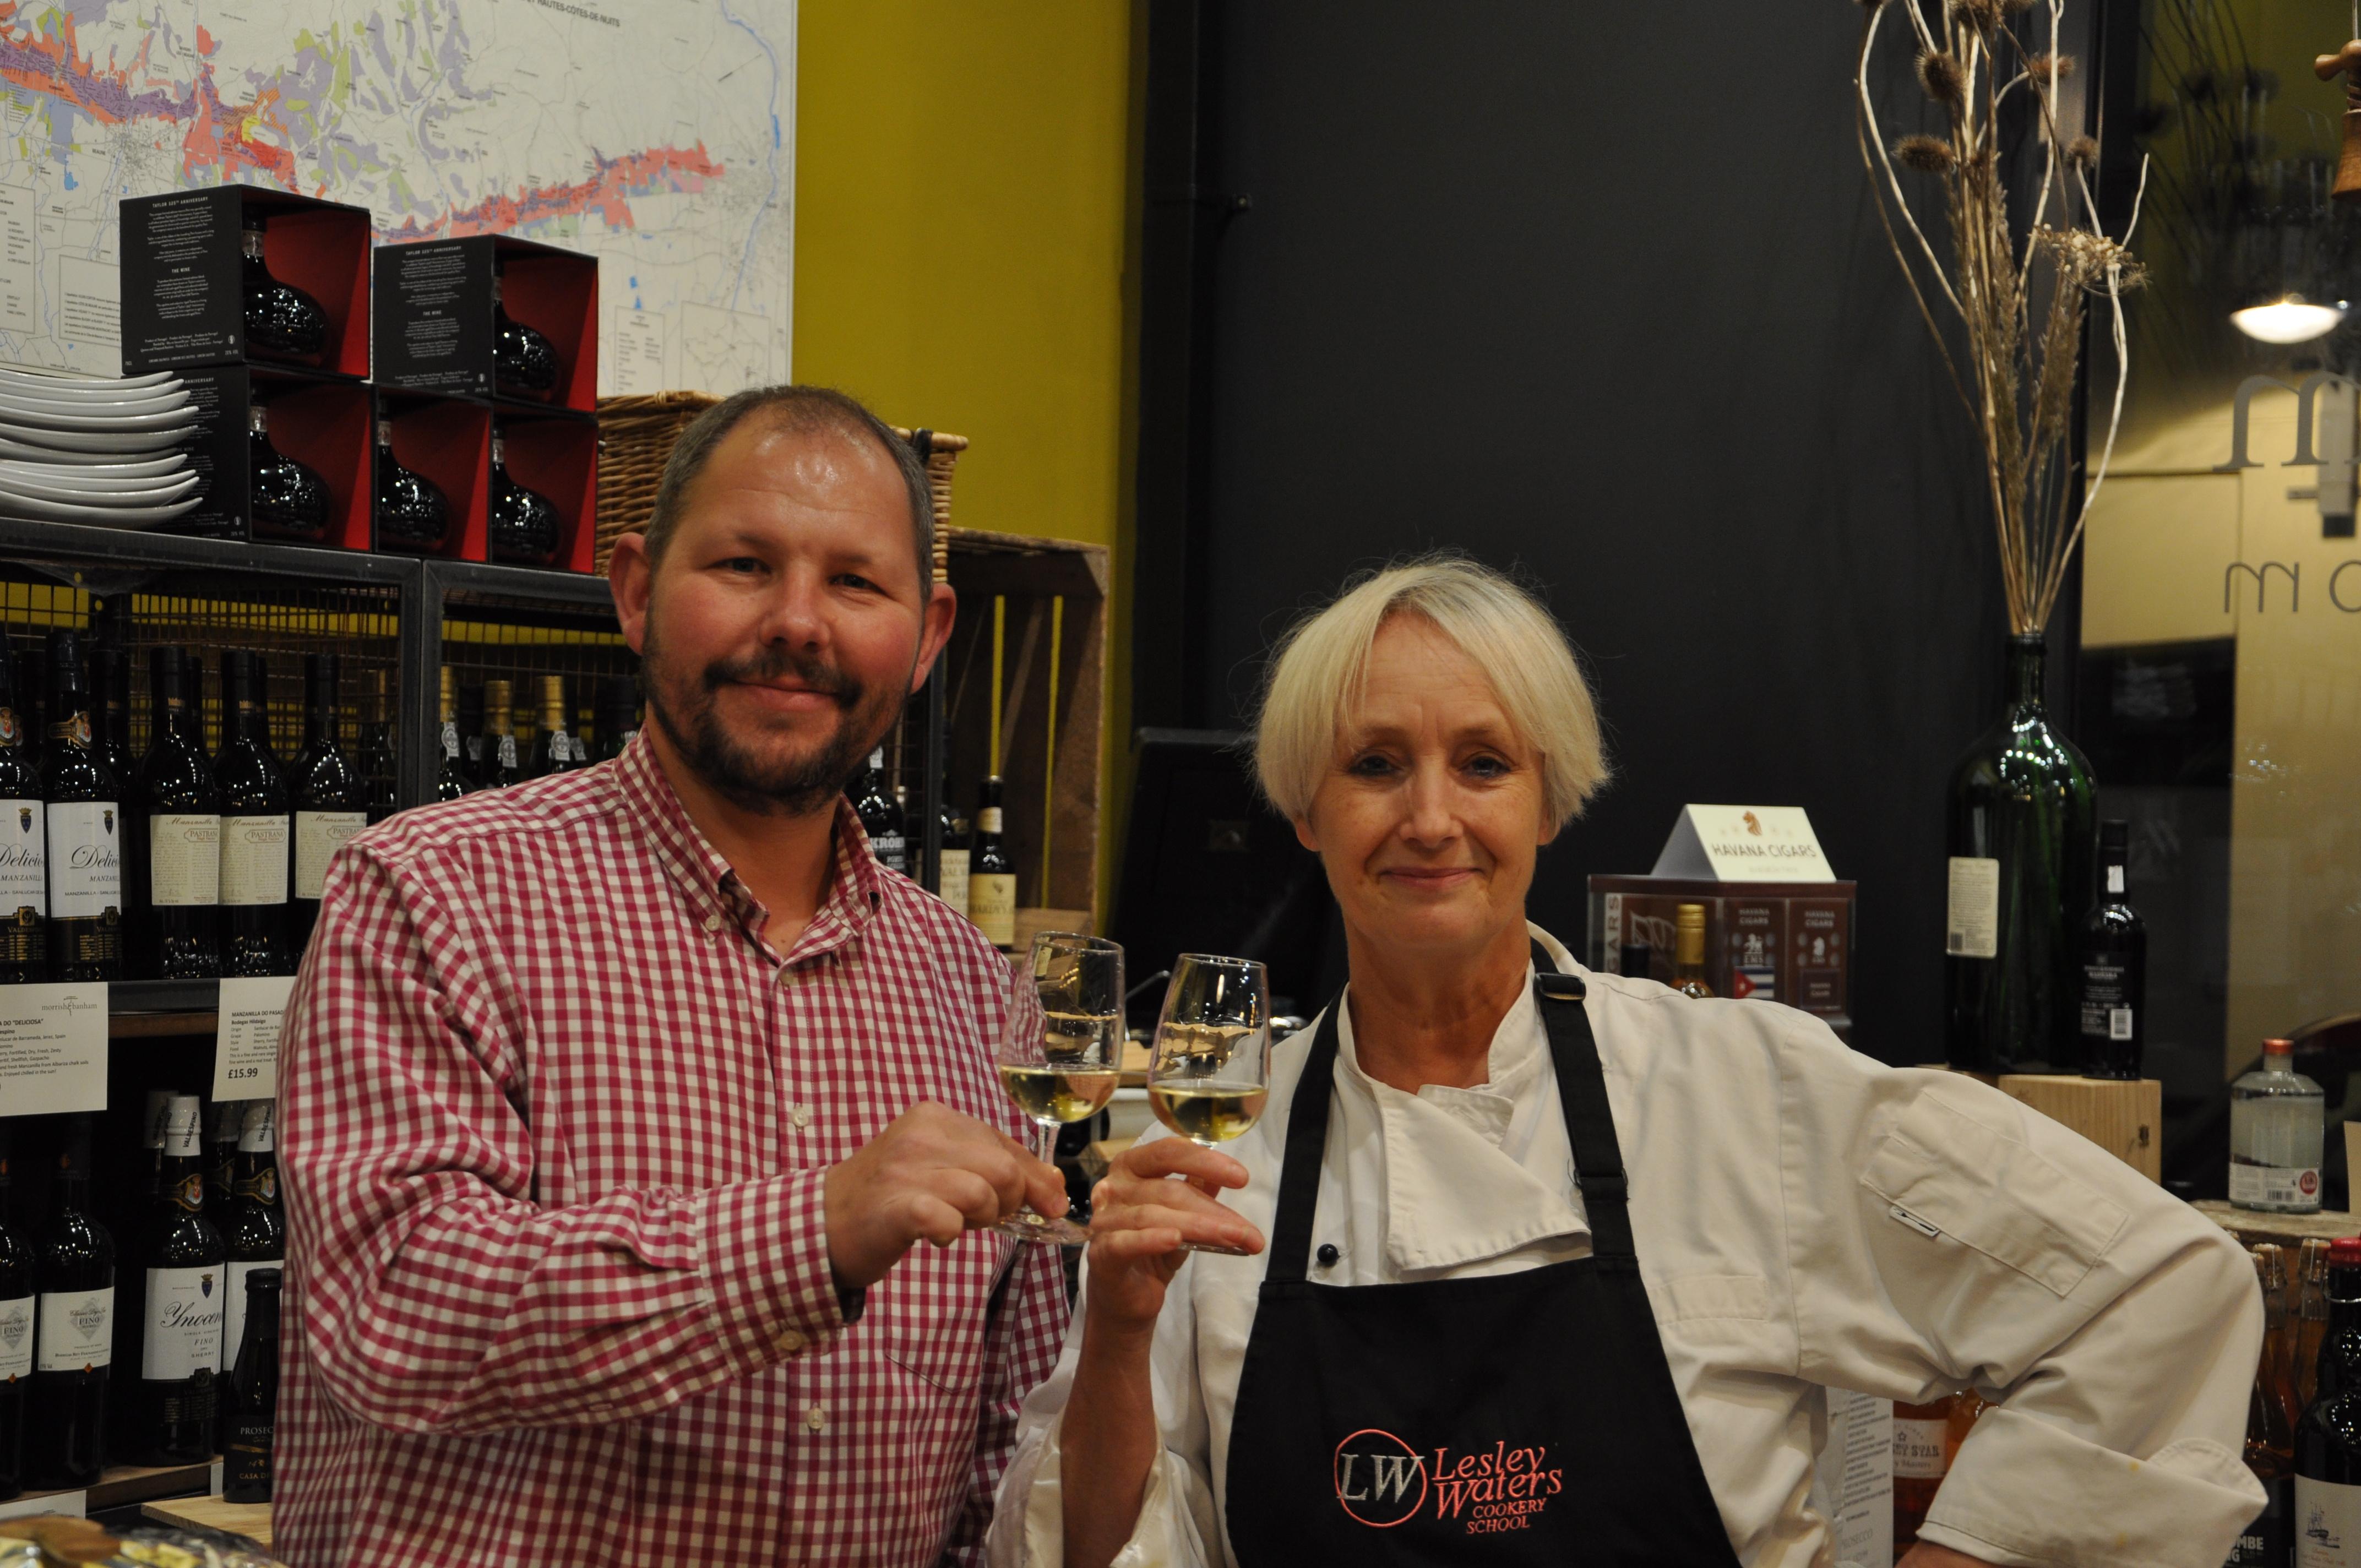 Mark Banham, Morrish and Banham wine merchants and tasting room, with Lesley Waters